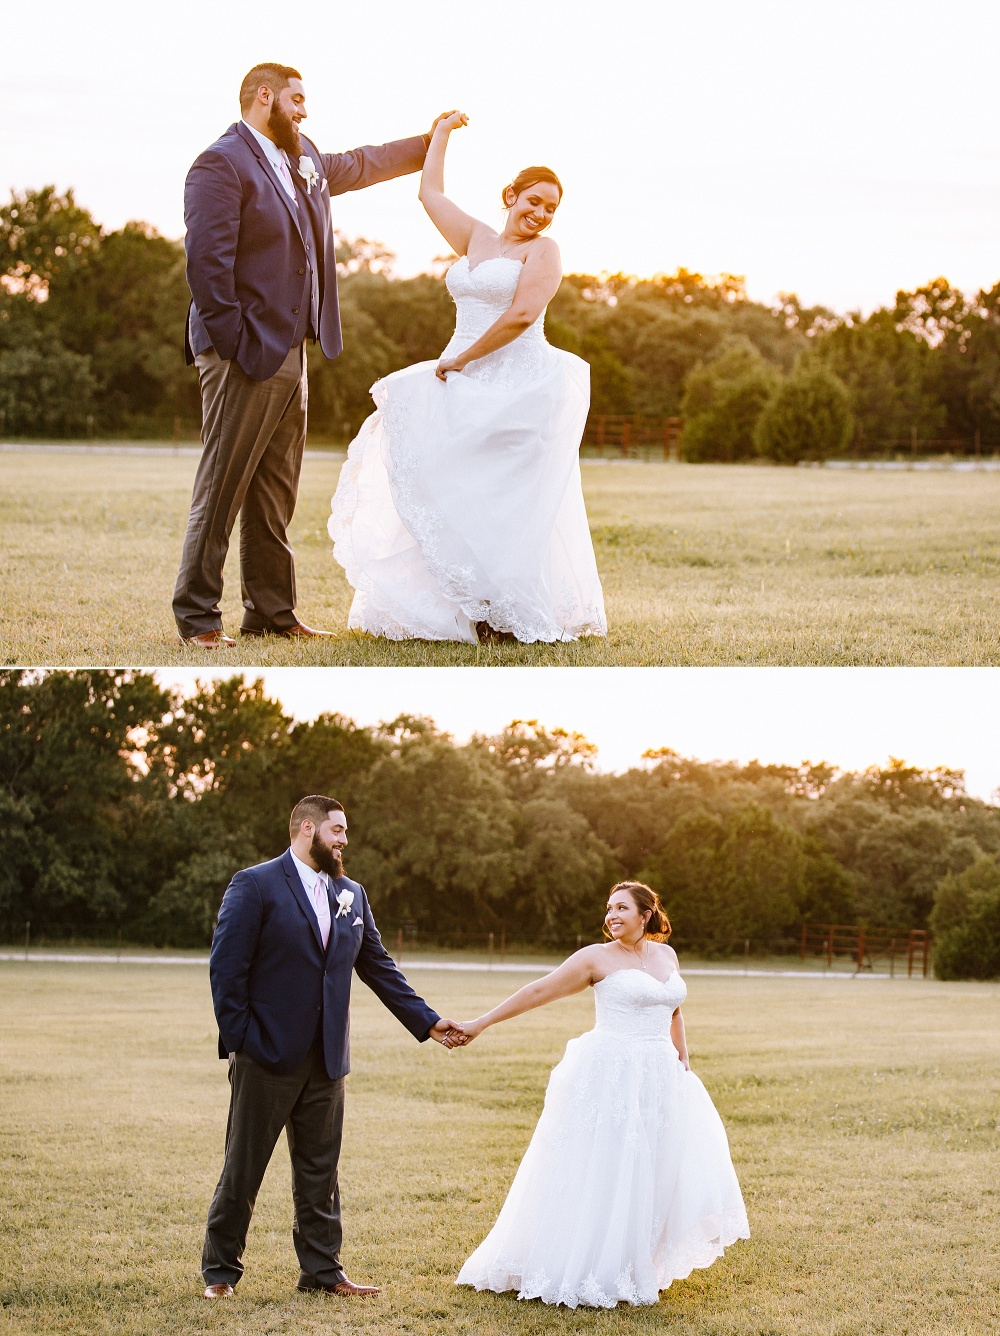 Wedding-Photographer-Bulverde-Texas-Western-Sky-Event-Venue-Carly-Barton-Photography_0053.jpg